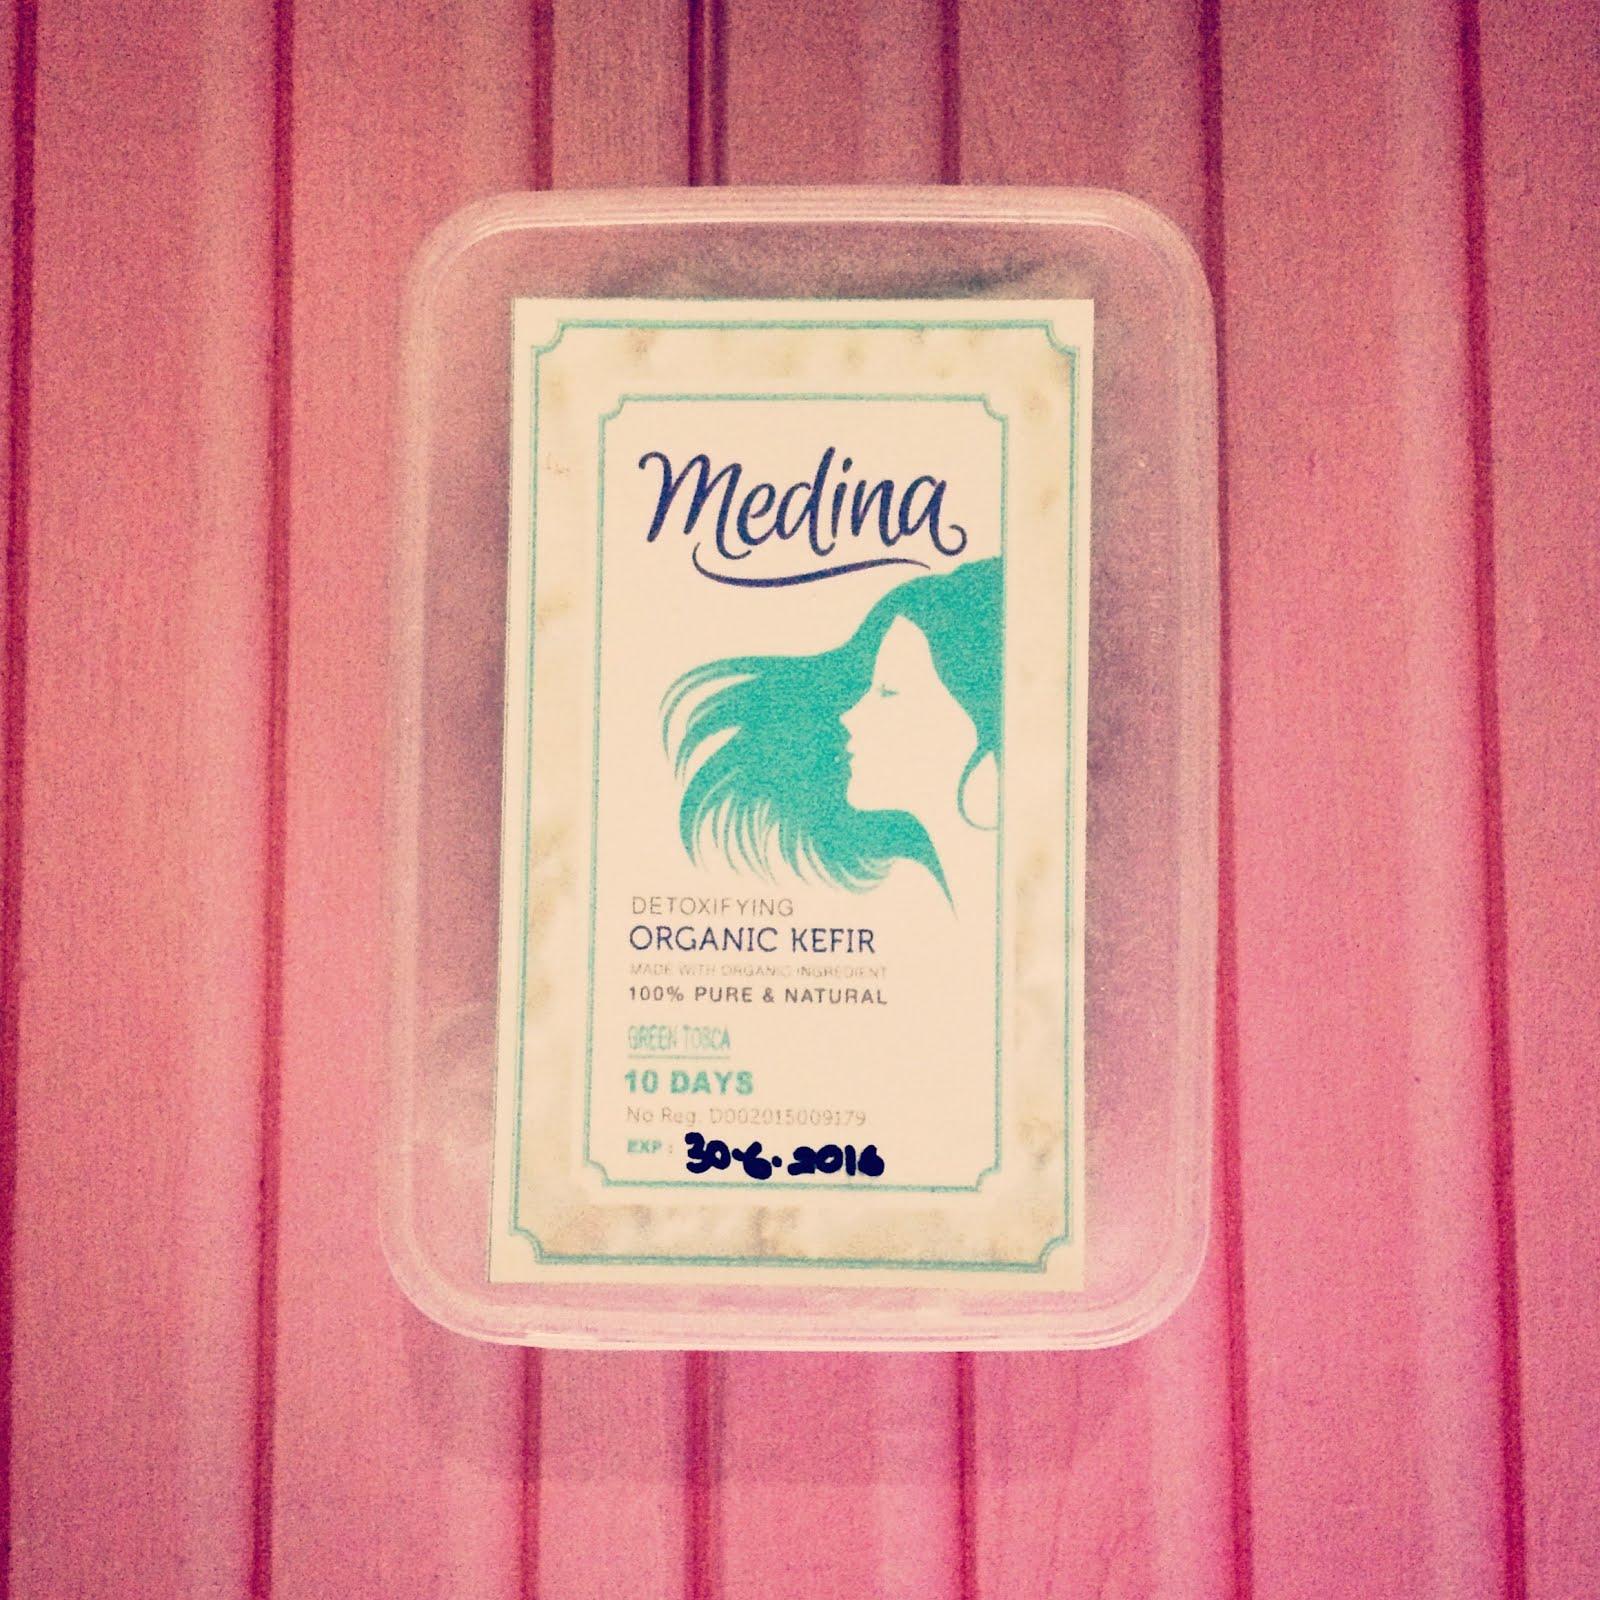 Review Shiseido Naturgo Mud Mask Handini Audita Masker Original Thailand Whitening Black 10 Days Face Detox Medina Organic Kefir